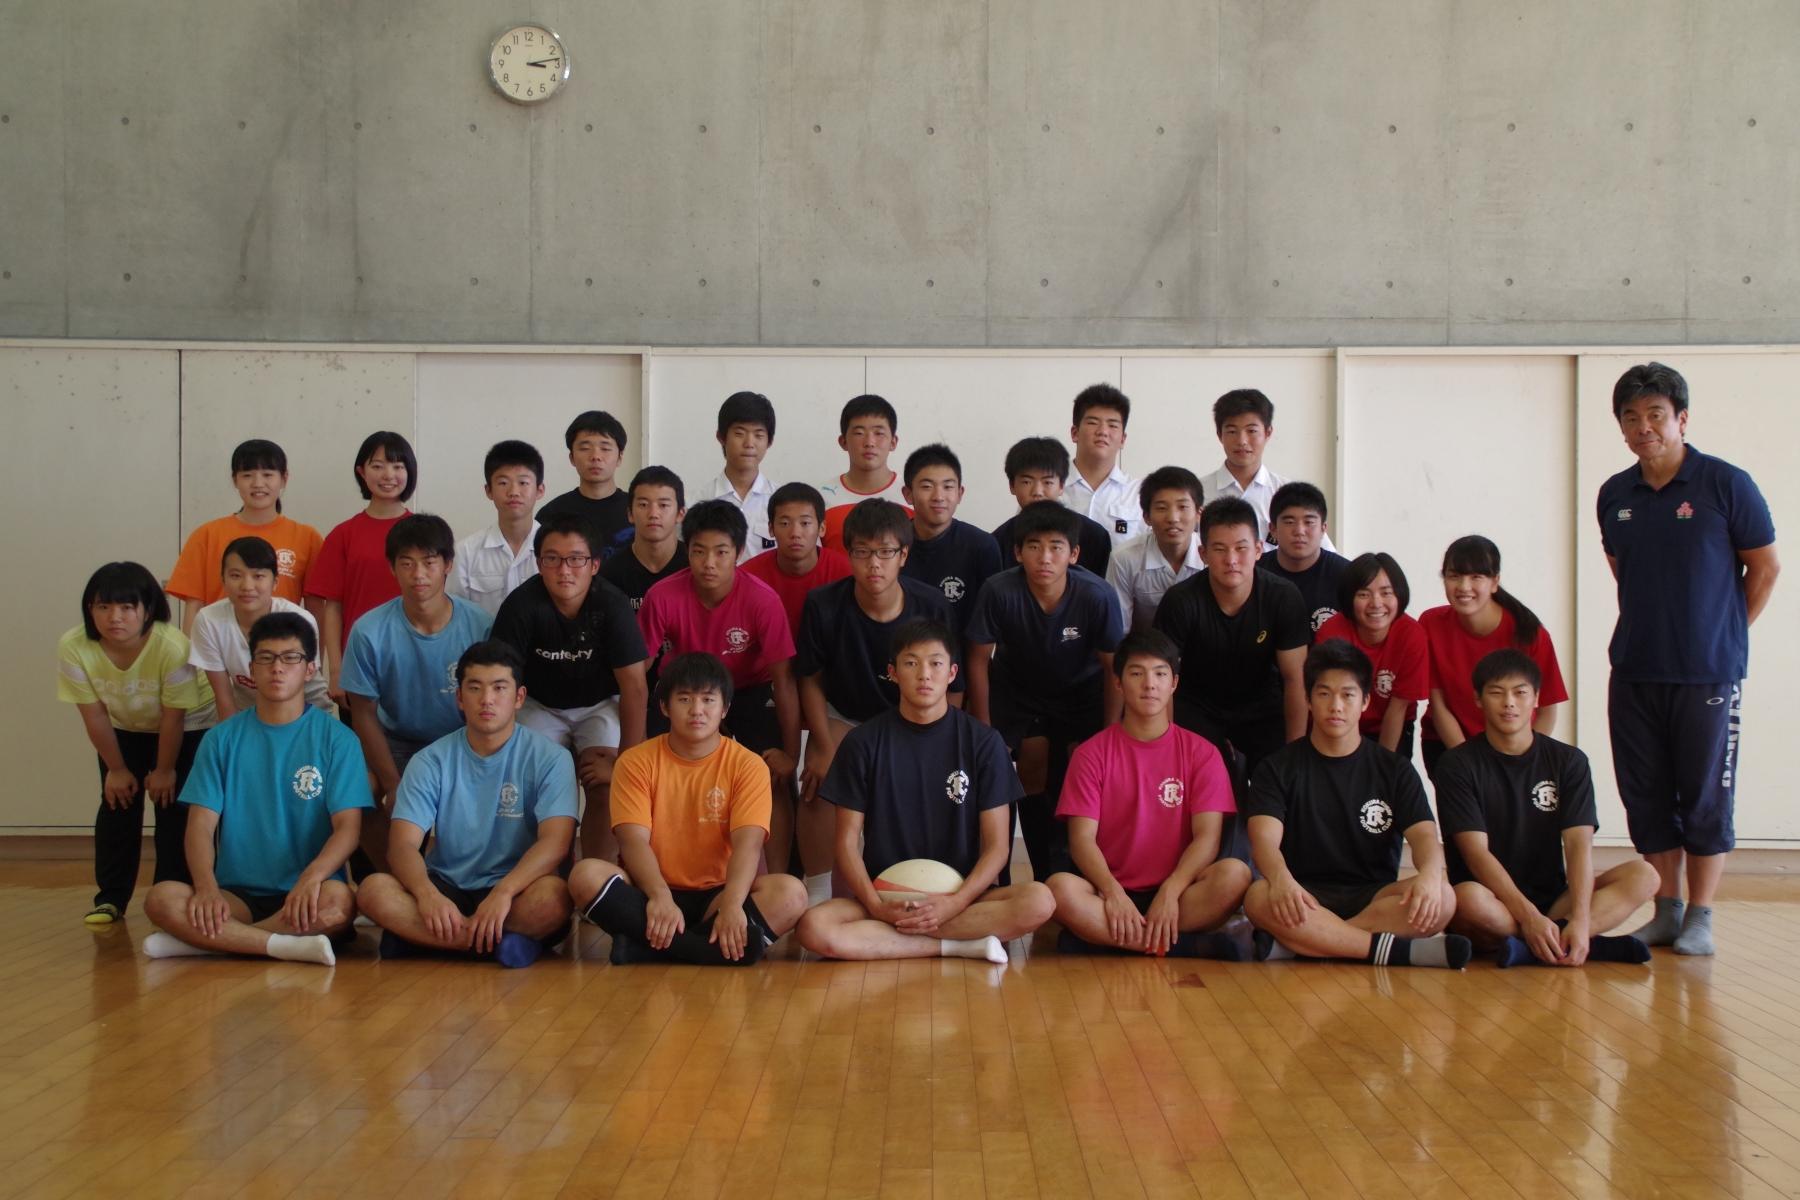 http://kokura-rugby.sakura.ne.jp/180701_151430_0640.jpg